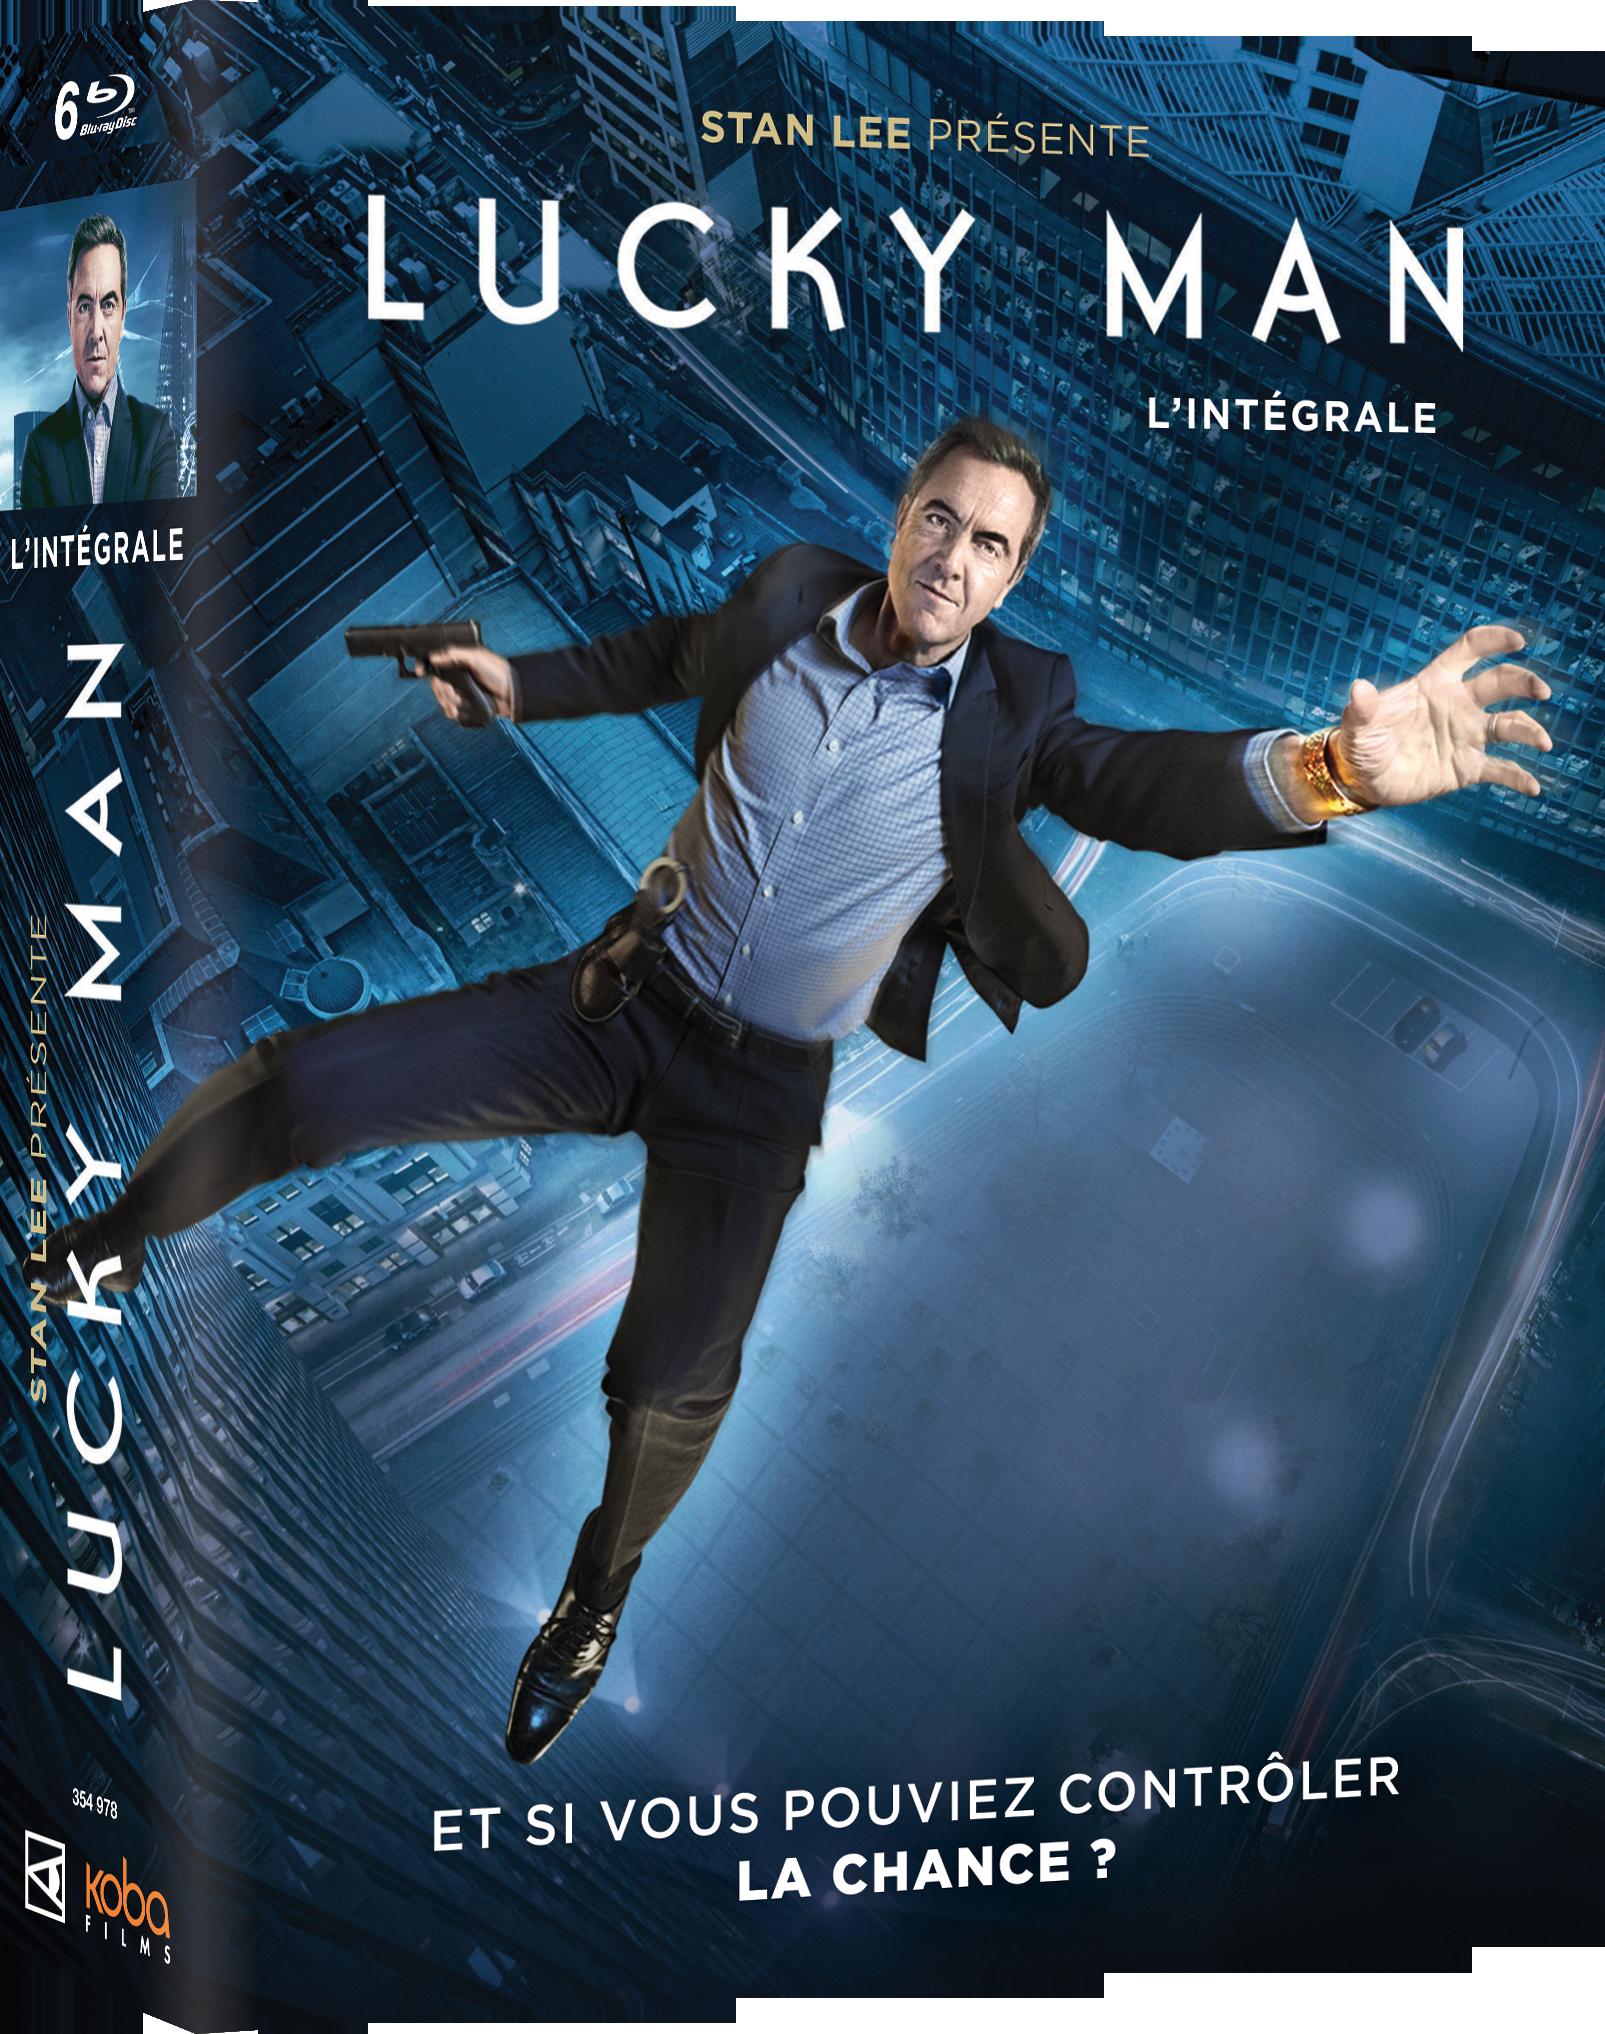 LUCKY MAN - INTEGRALE SAISONS 1 à 3 (6 BR)